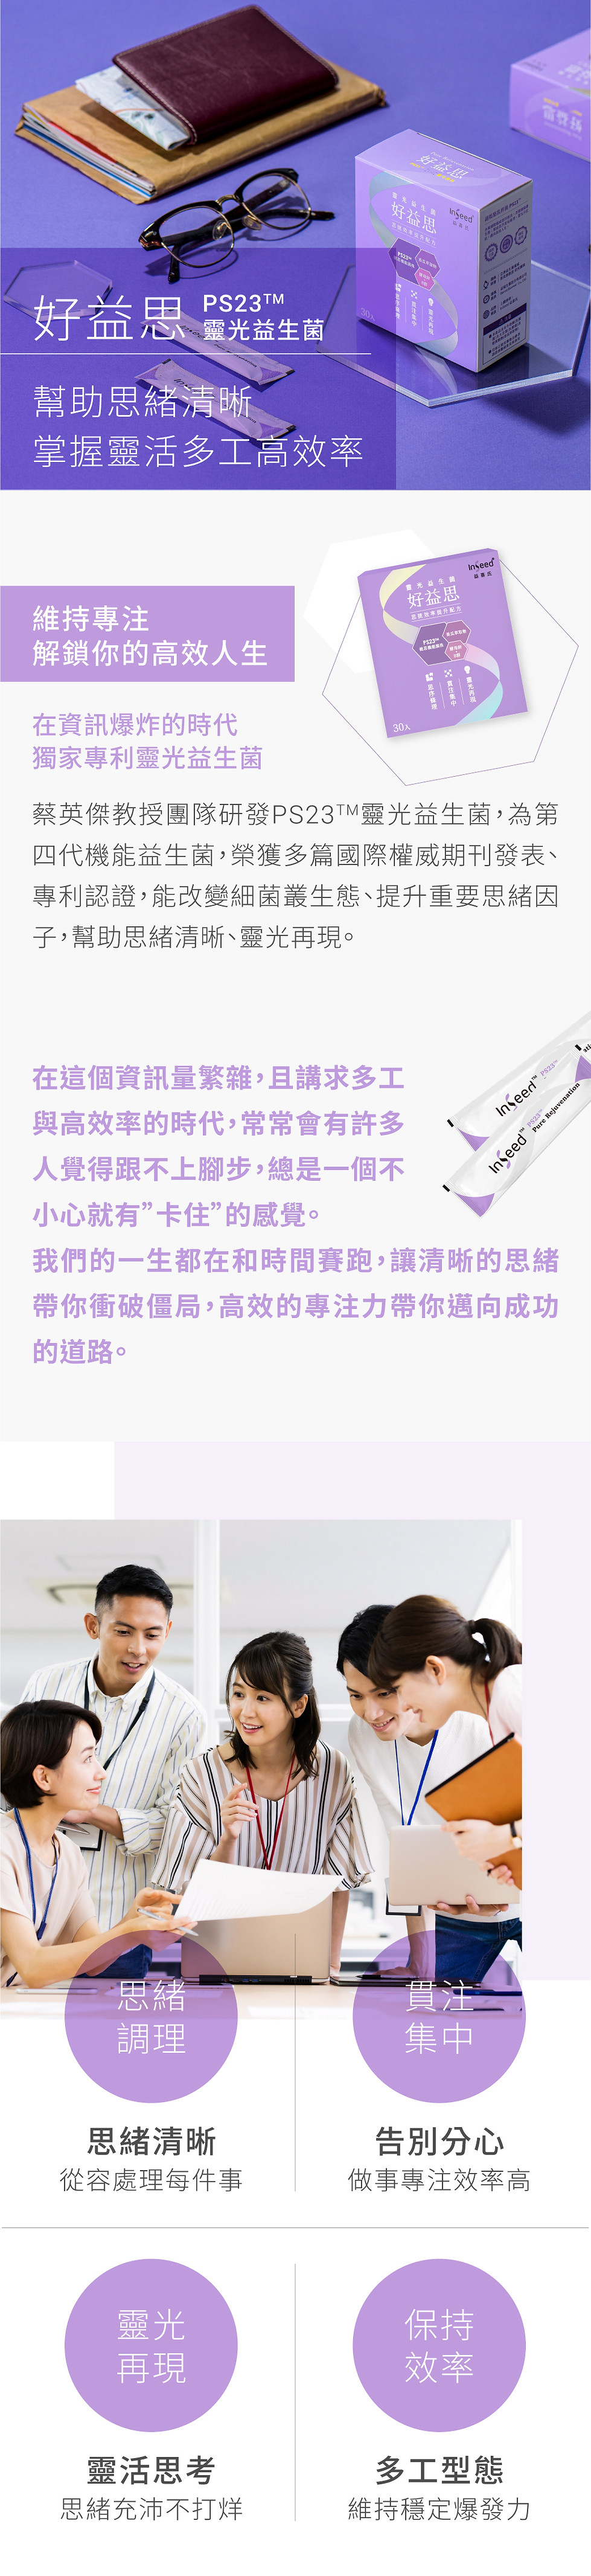 Productpage臨時版_好益思_01.jpg